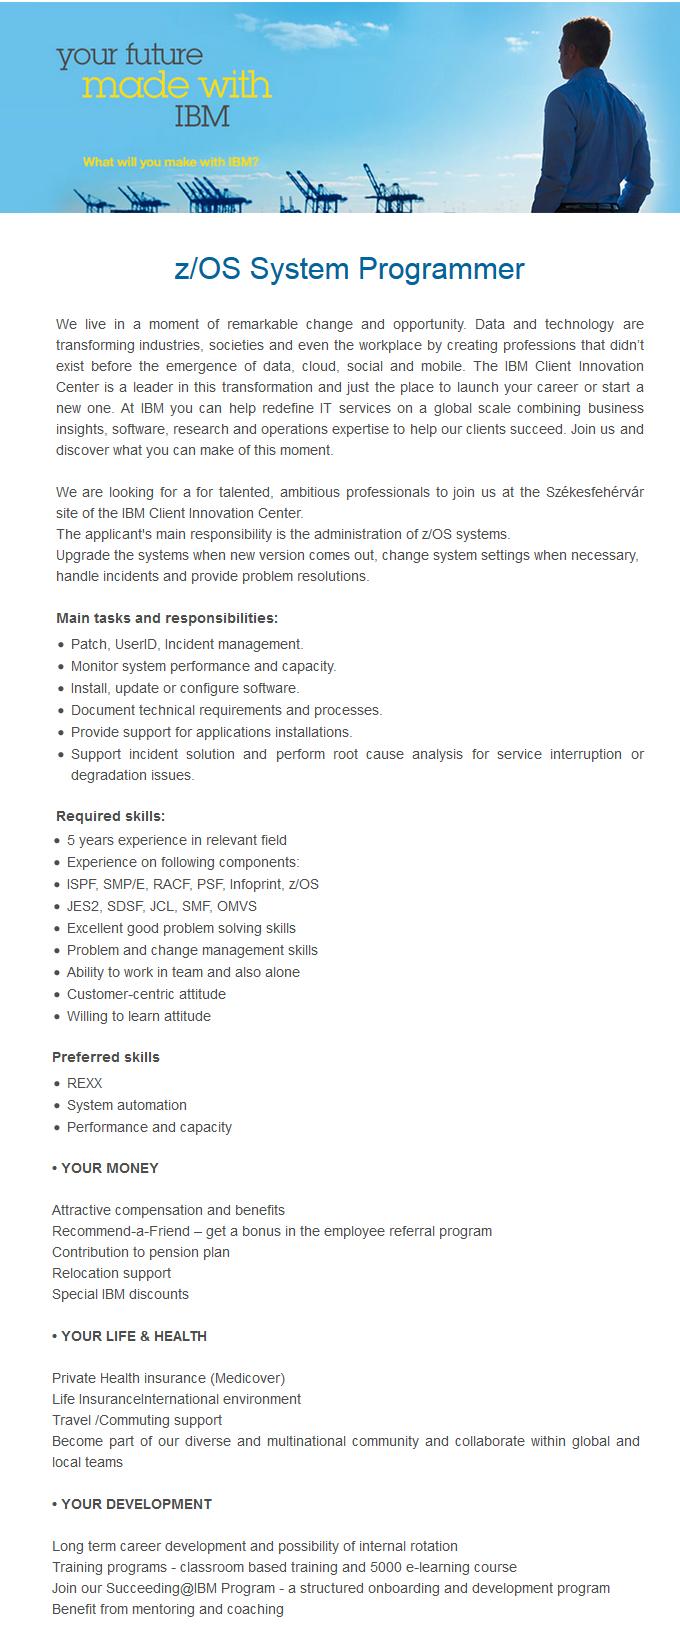 z/OS System Programmer, IBM ISSC - Apply on eJobs!